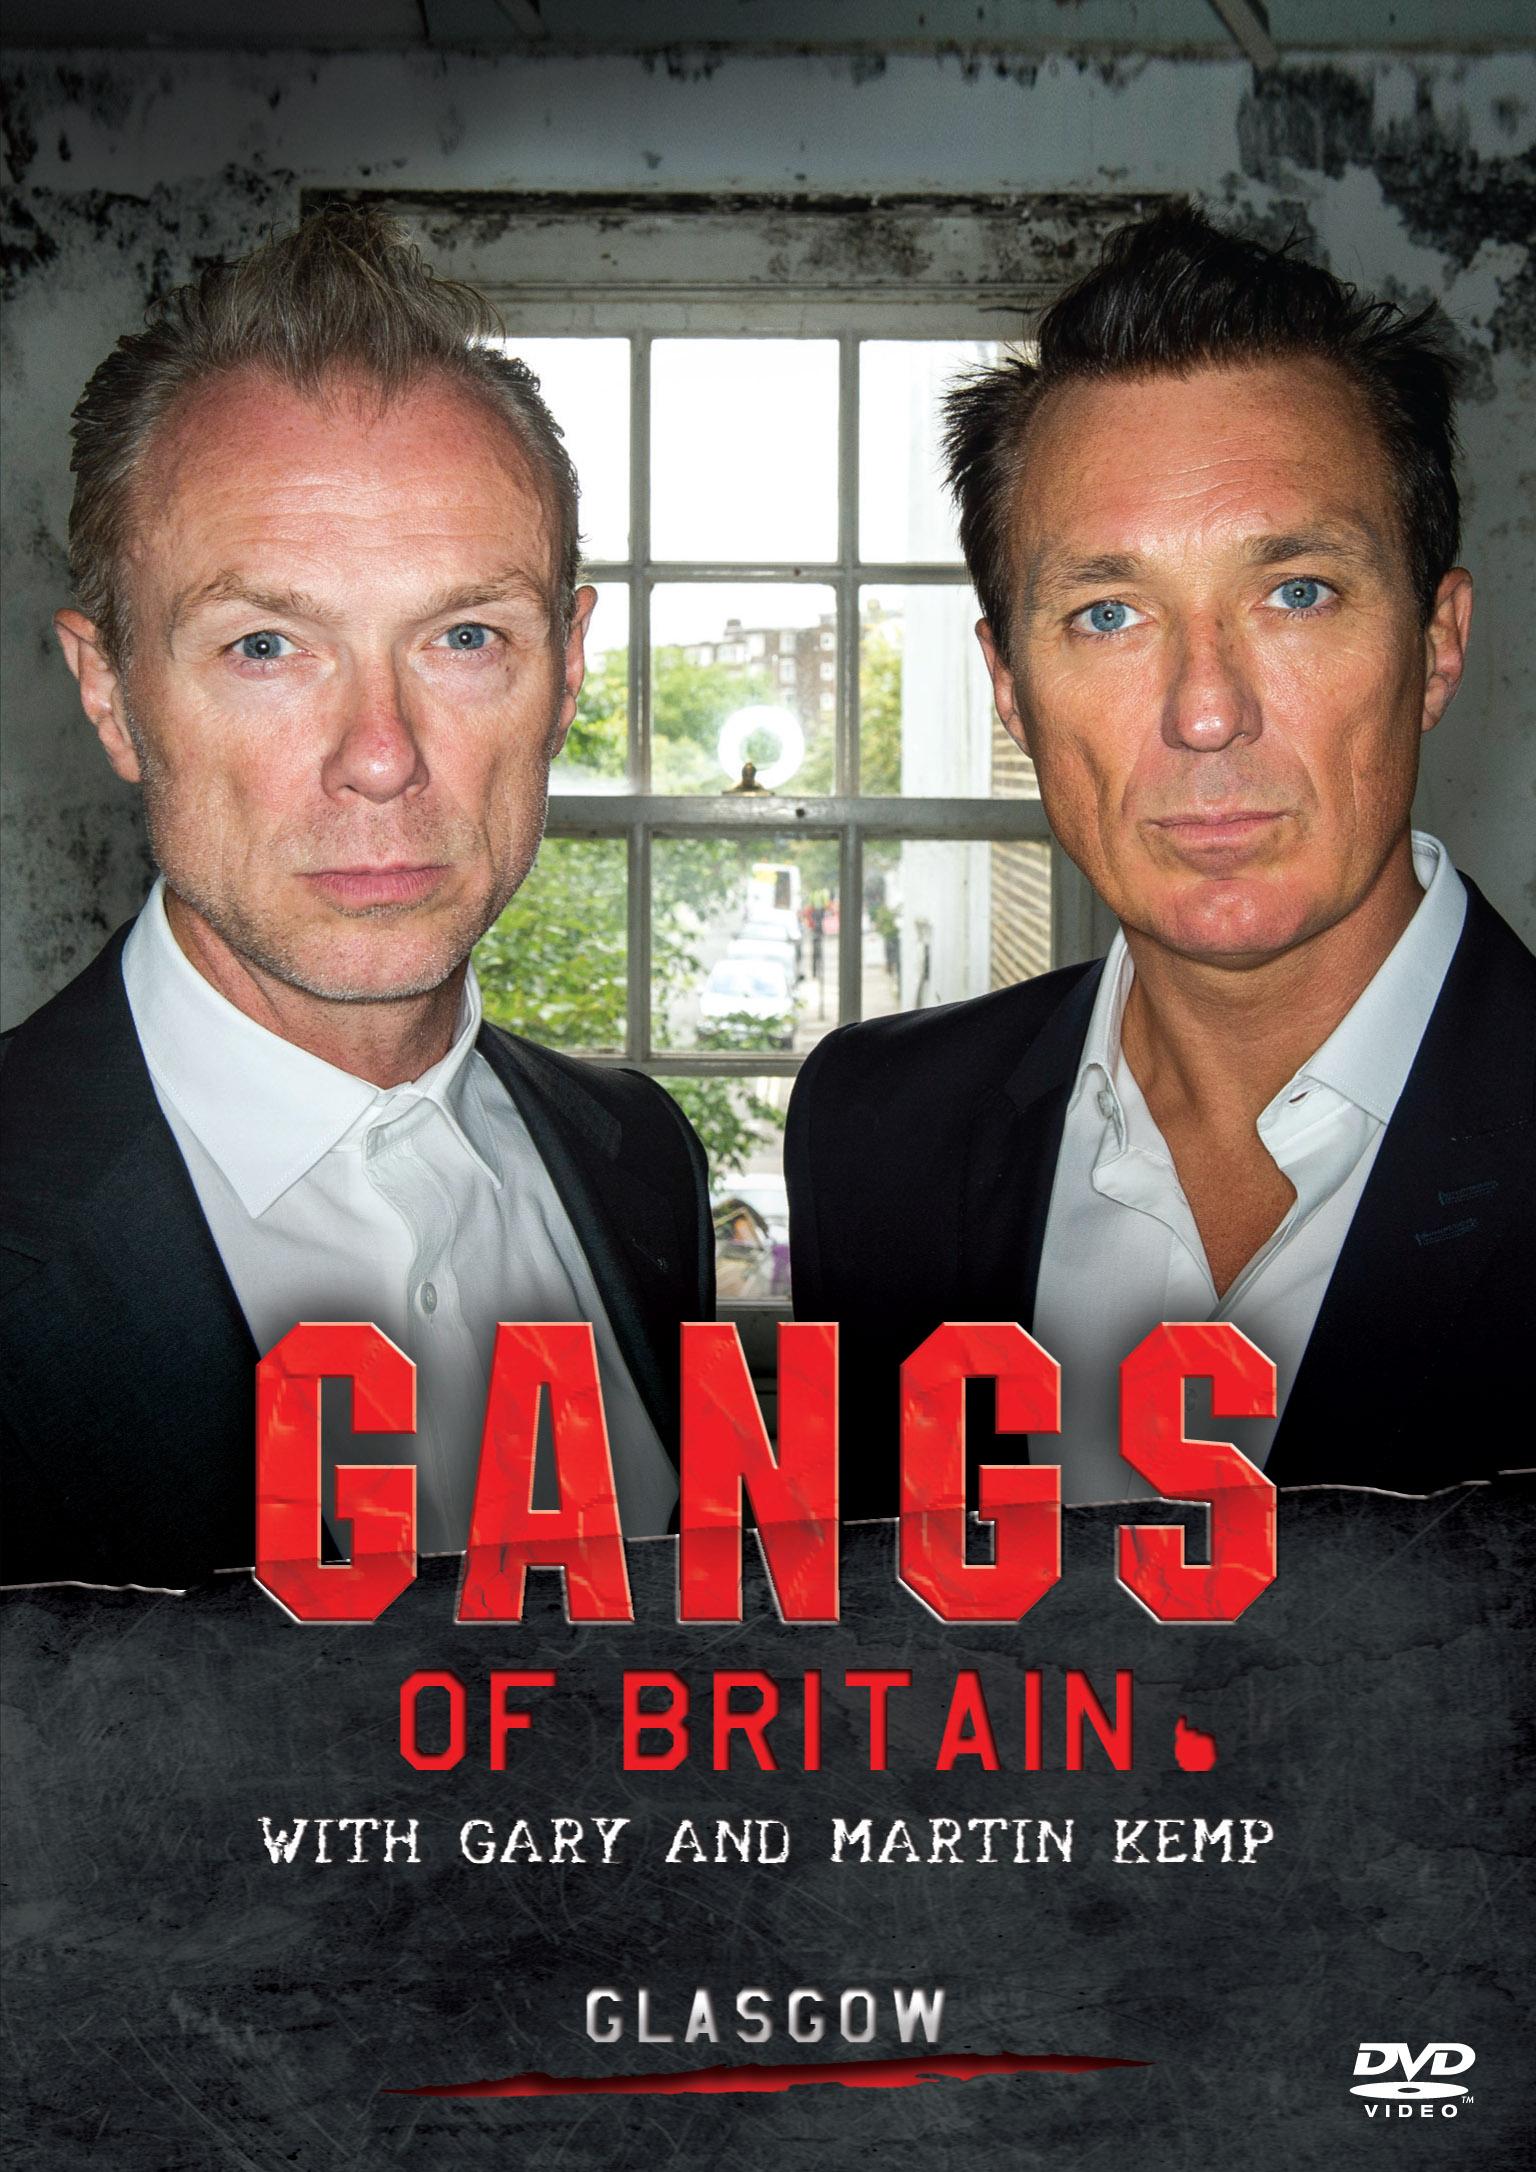 Gangs Of Britain With Gary And Martin Kemp: Season 1